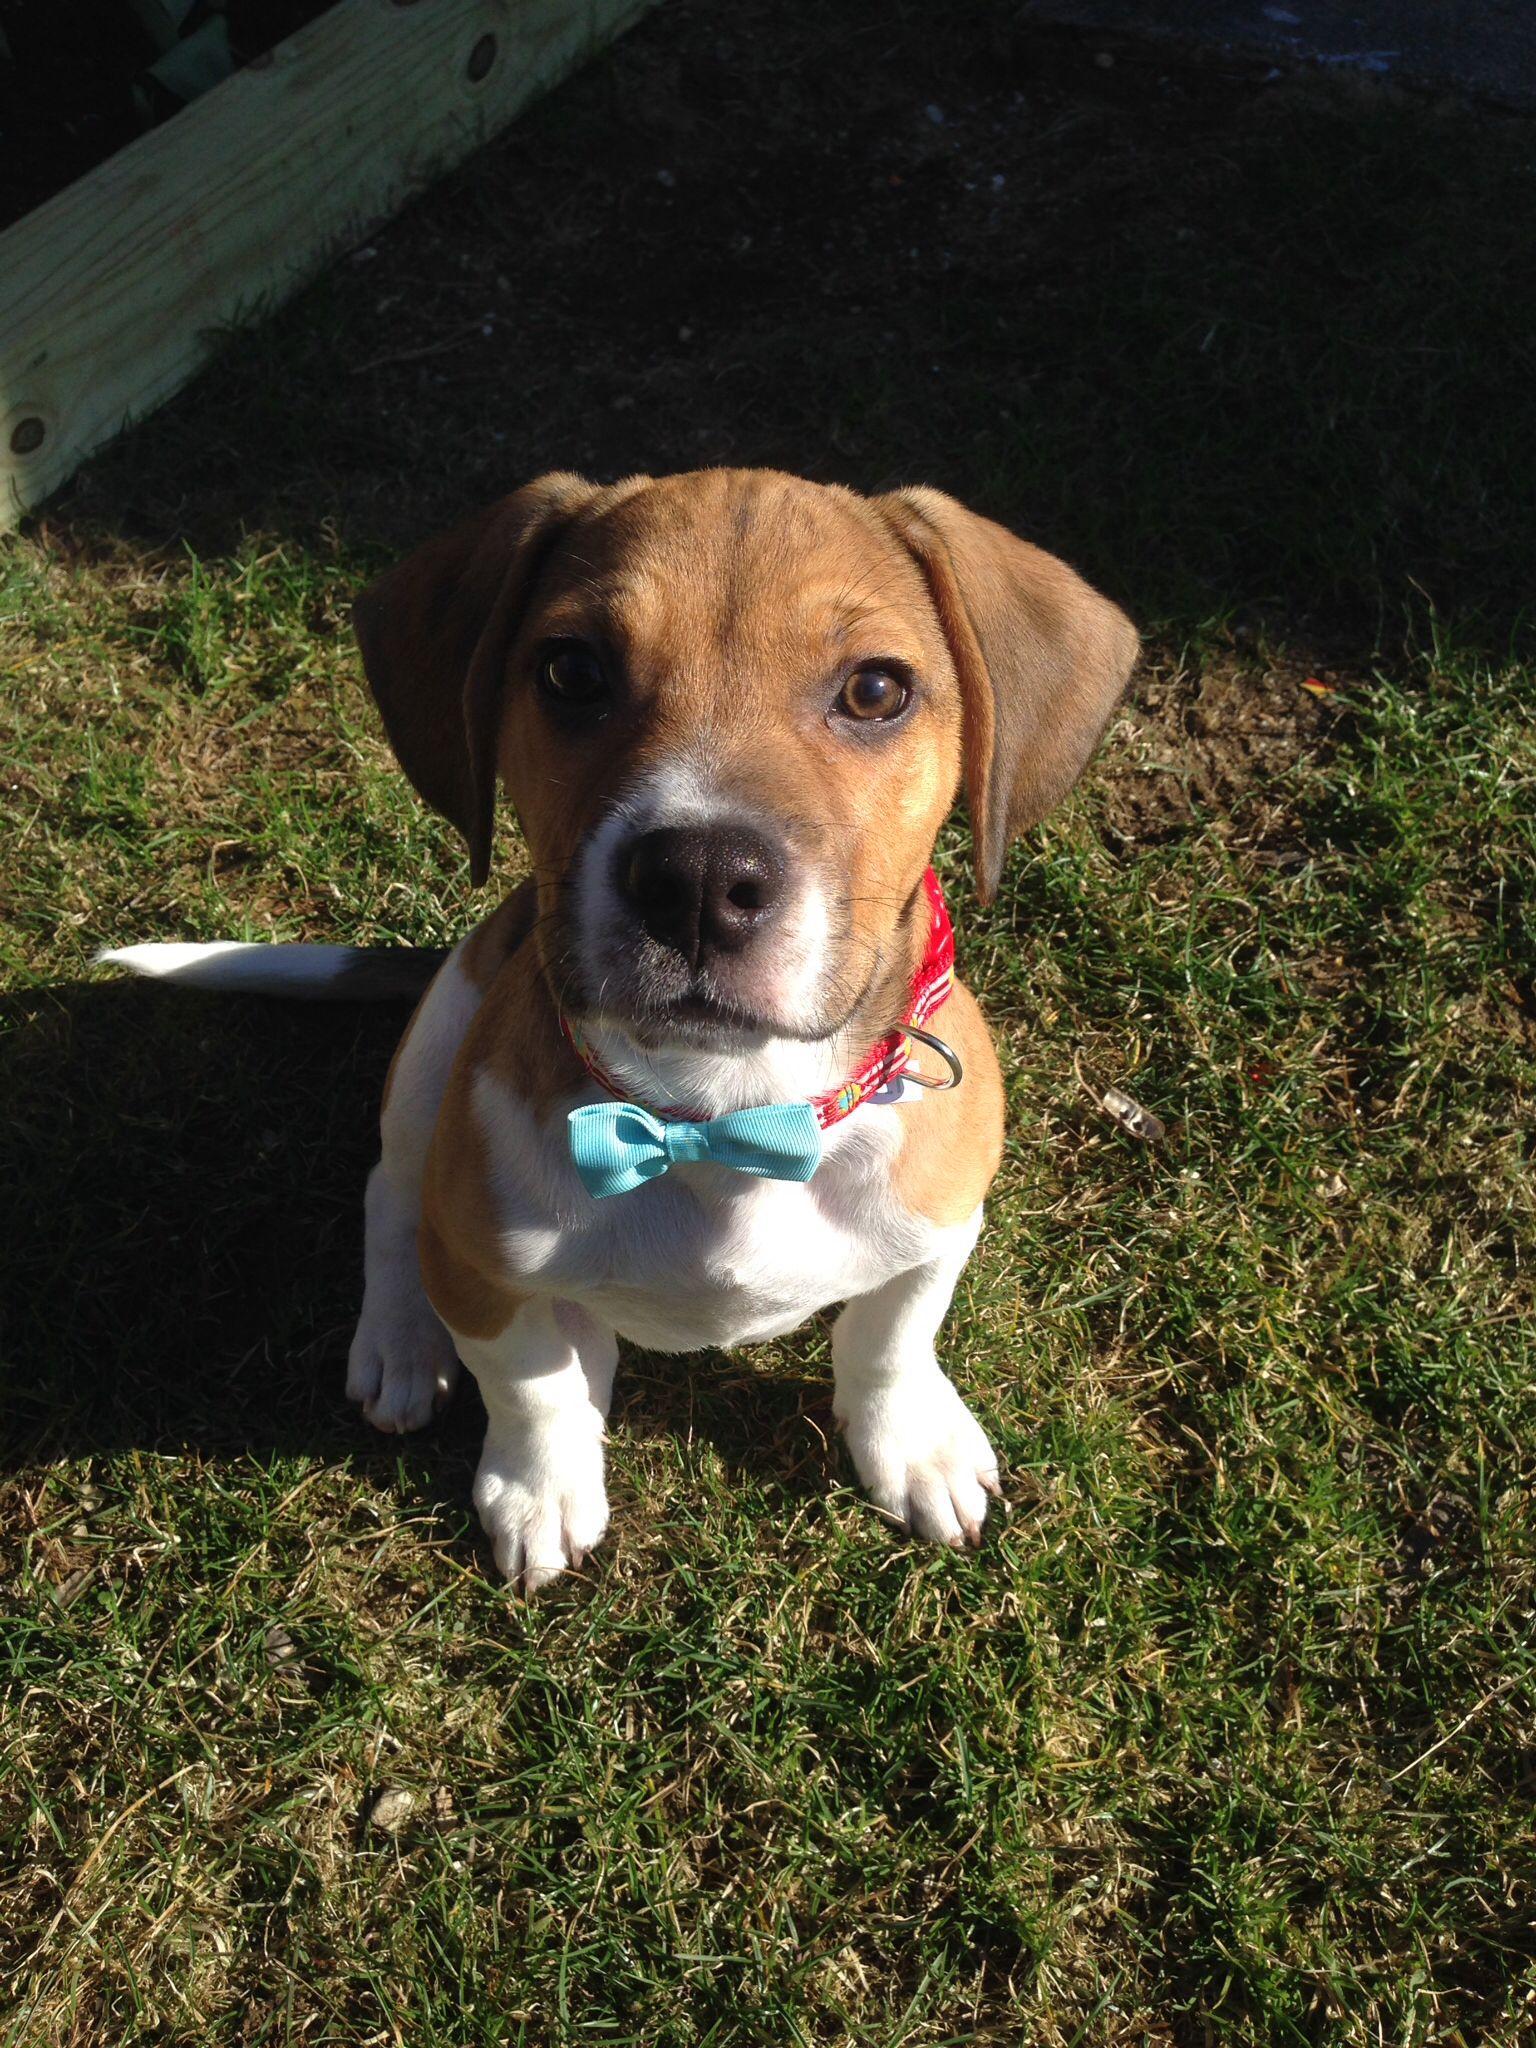 My Frengle French Bulldog Beagle Puppy Reeses Beagle Puppy